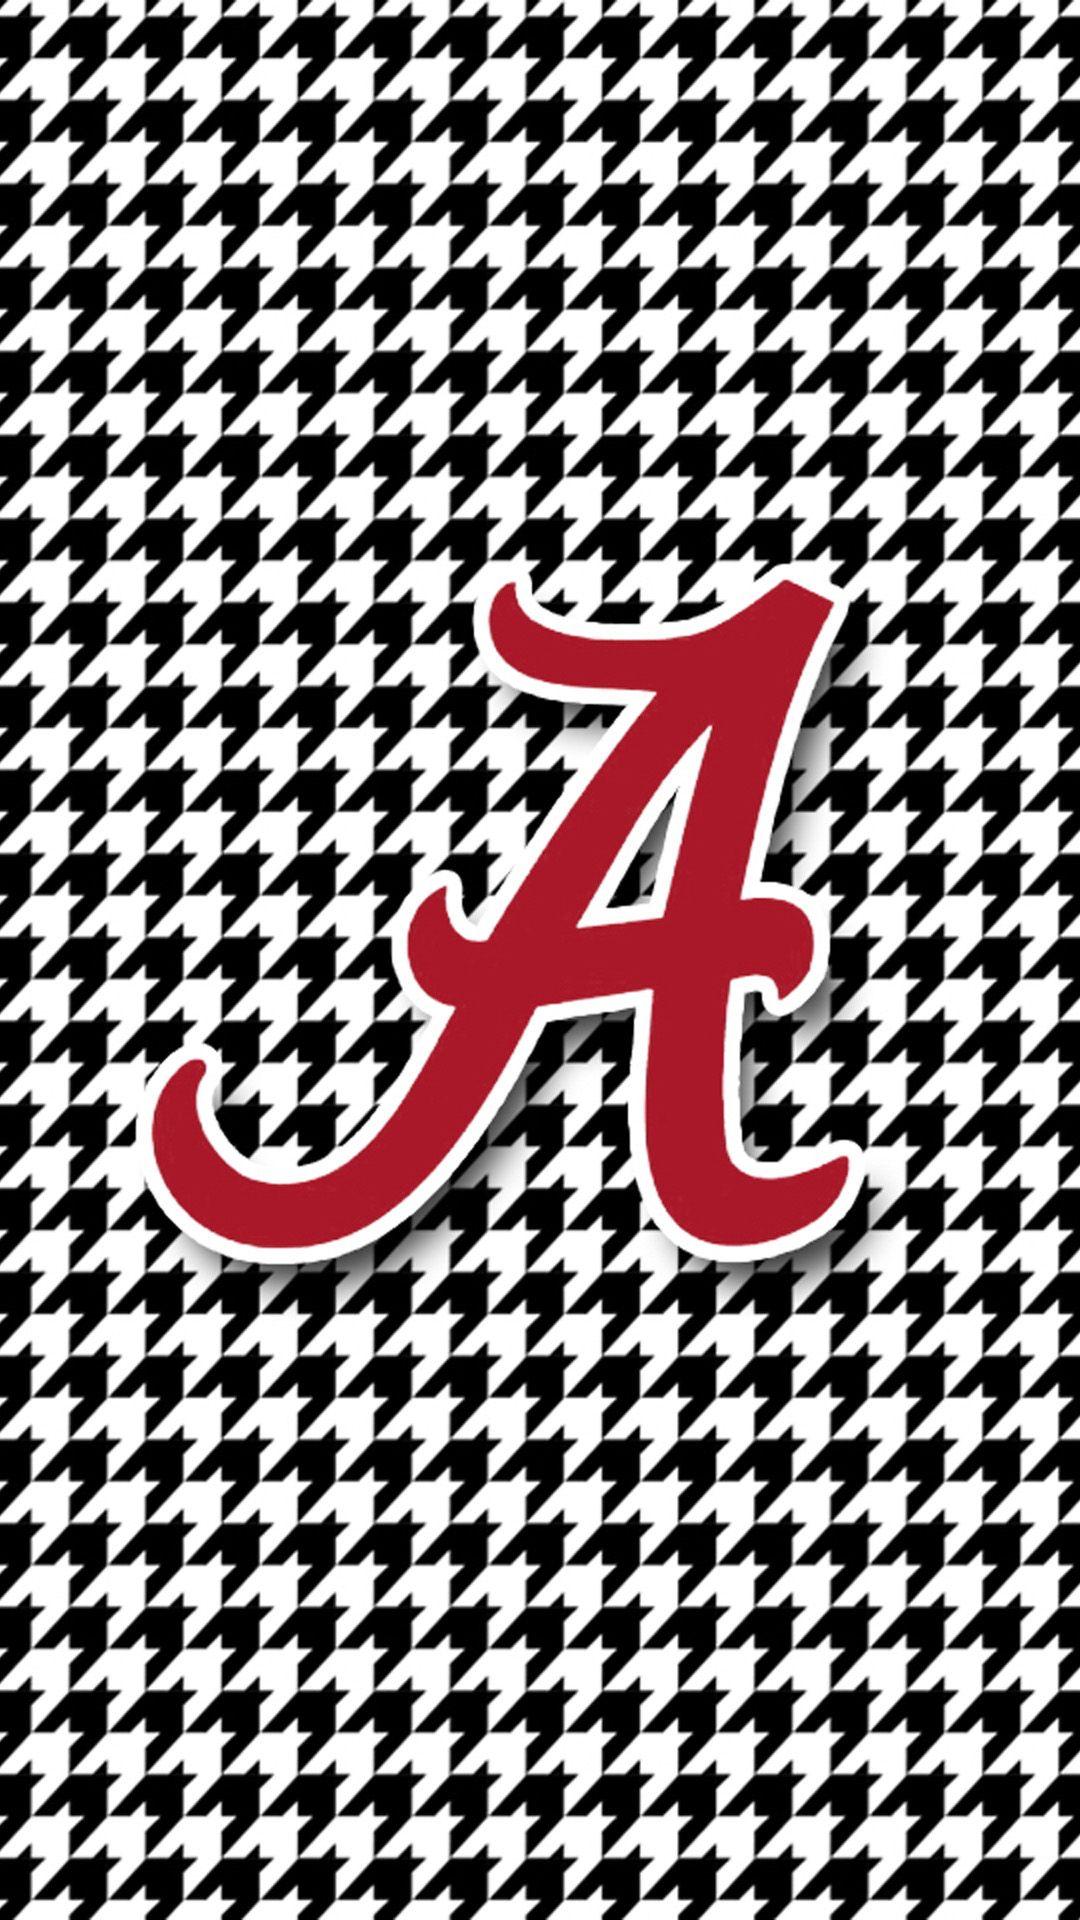 Alabama Football Wallpaper Hd For Android Pixelstalk Net Alabama Crimson Tide Logo Alabama Wallpaper Alabama Crimson Tide